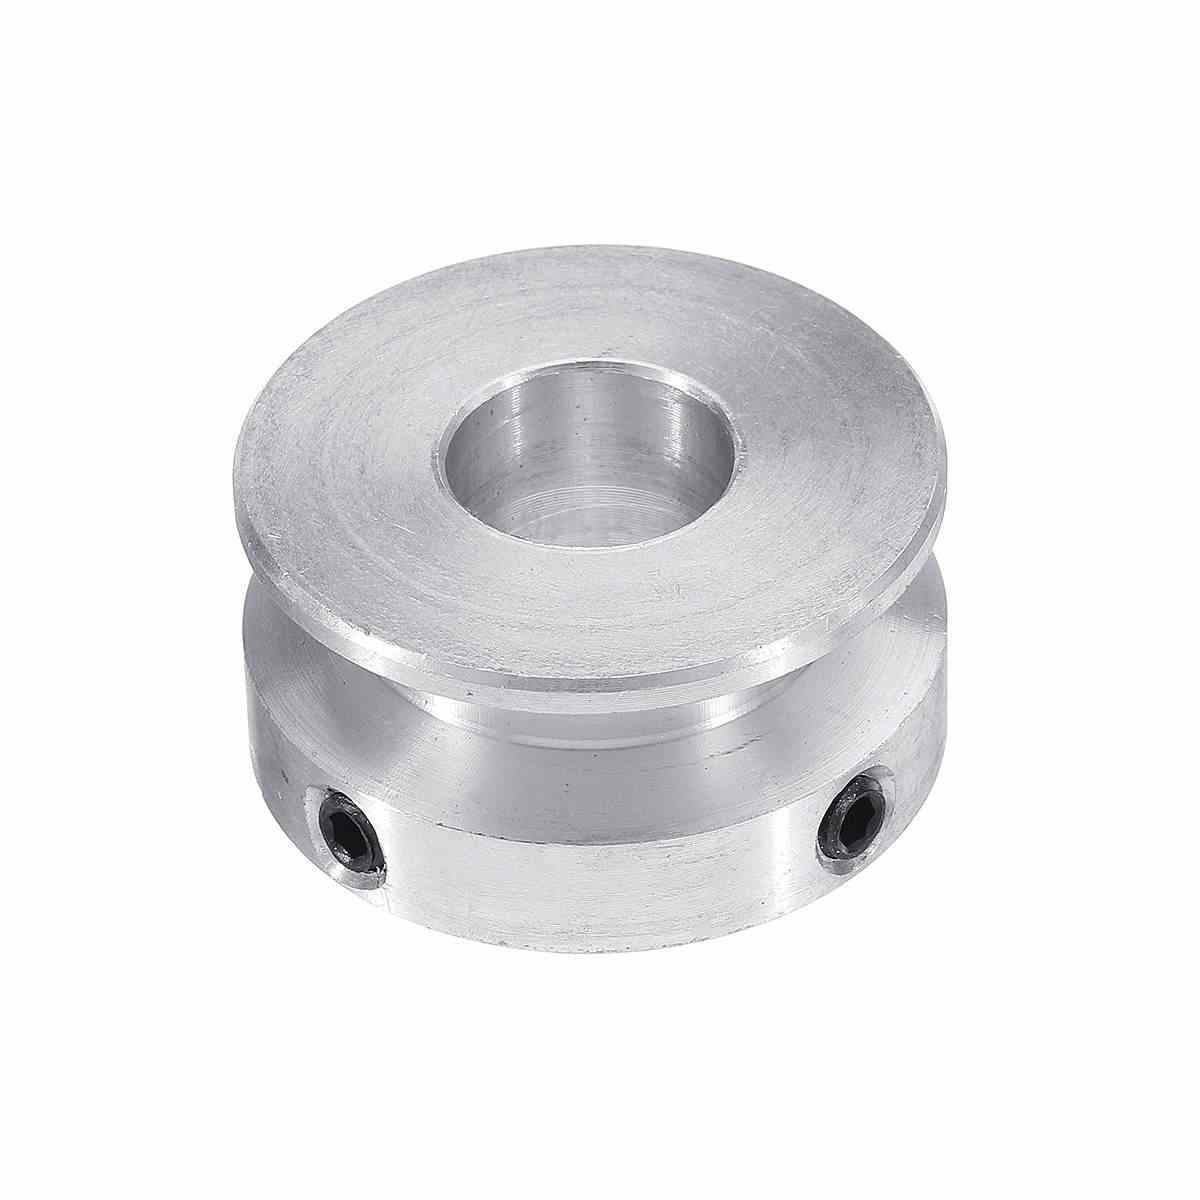 "1PC כסף אלומיניום סגסוגת 30MM אחת חריץ גלגלת 4-16MM נשא קבוע גלגלת גלגל עבור מנוע פיר 6 מ""מ עגול חגורה"